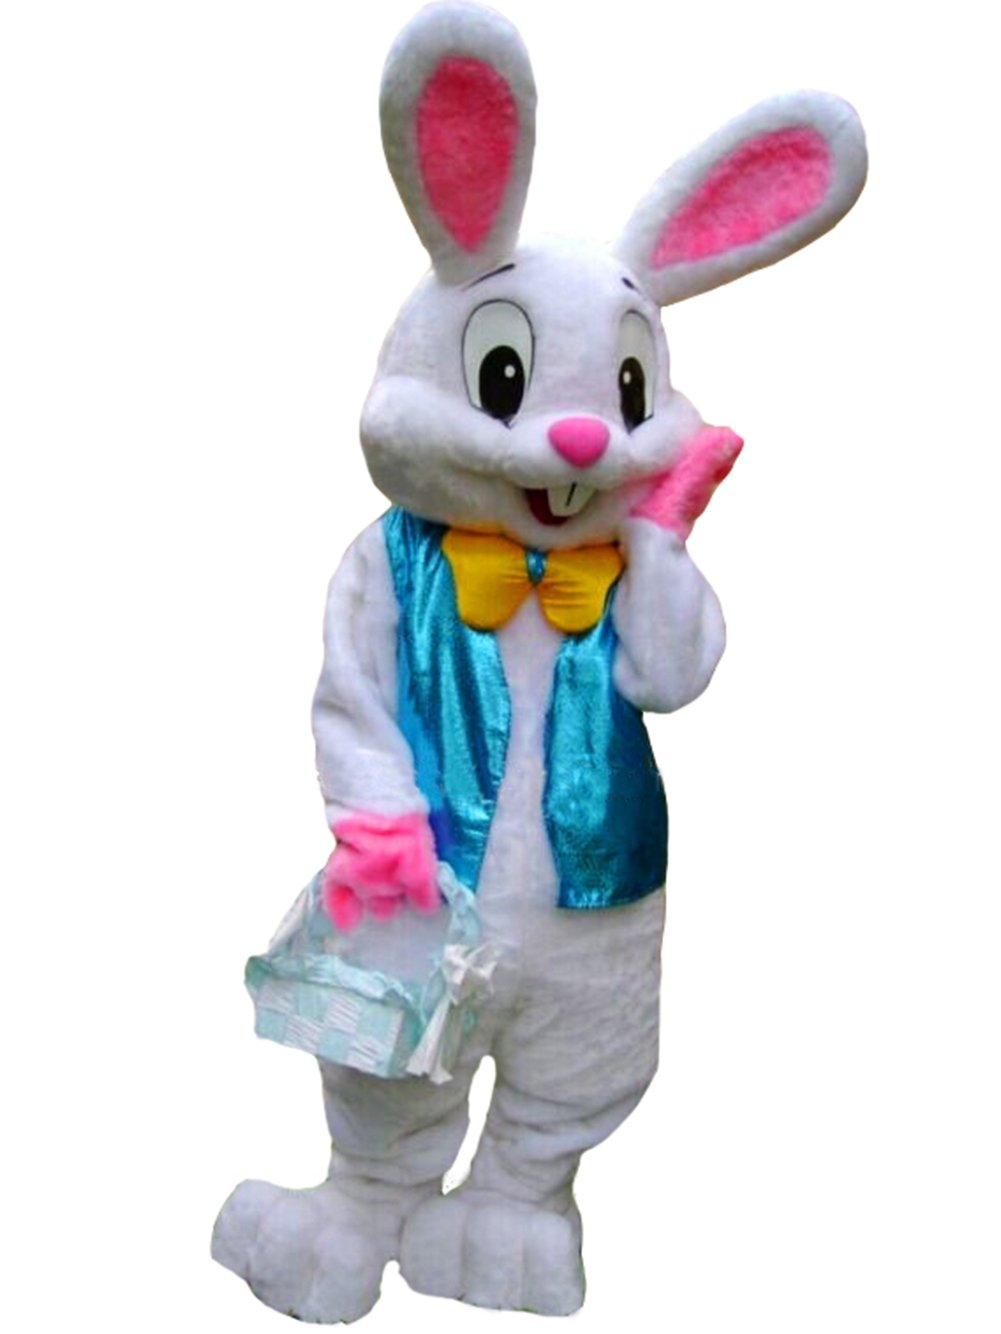 ZYZB Deluxe Plush Easter Bunny Mascot Costume Bunny Costume (S (161 cm-170 cm)- 5'3'' to 5'7'')